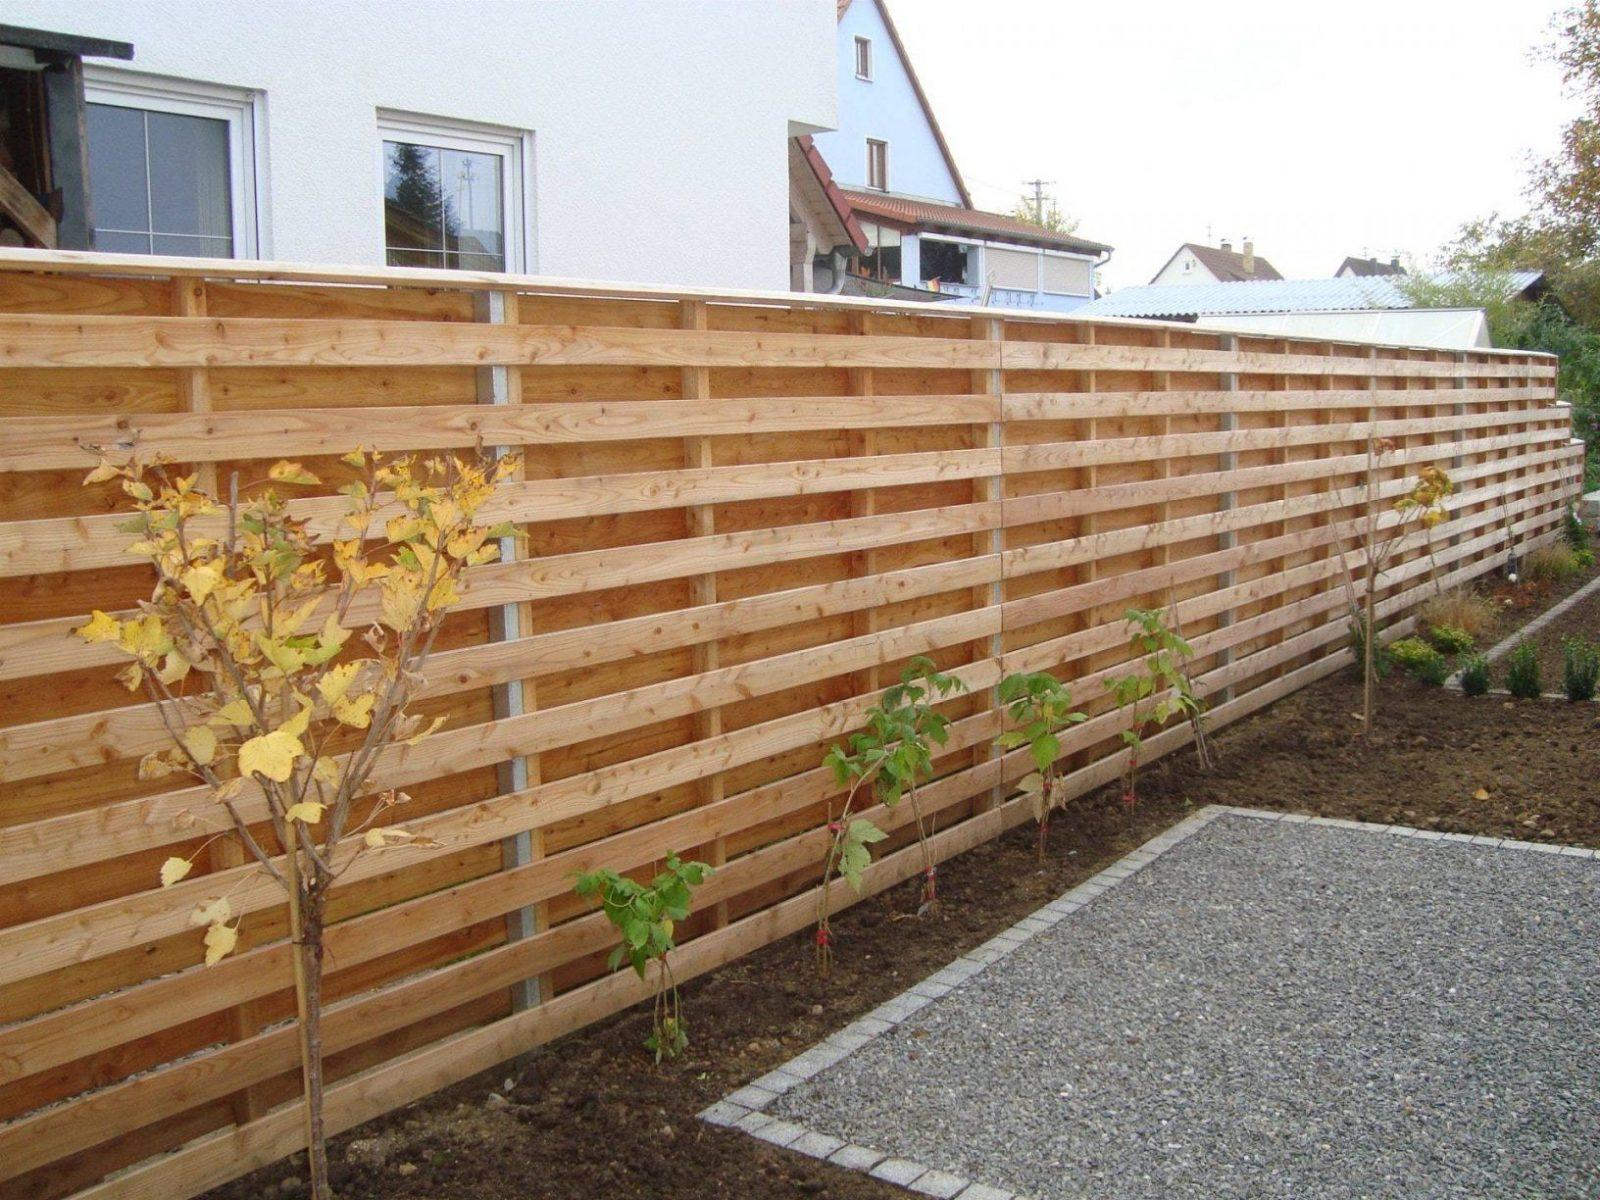 Fabelhafte Paletten Garten Sichtschutz Garten Sichtschutz Selber von Sichtschutz Aus Paletten Bauen Bild